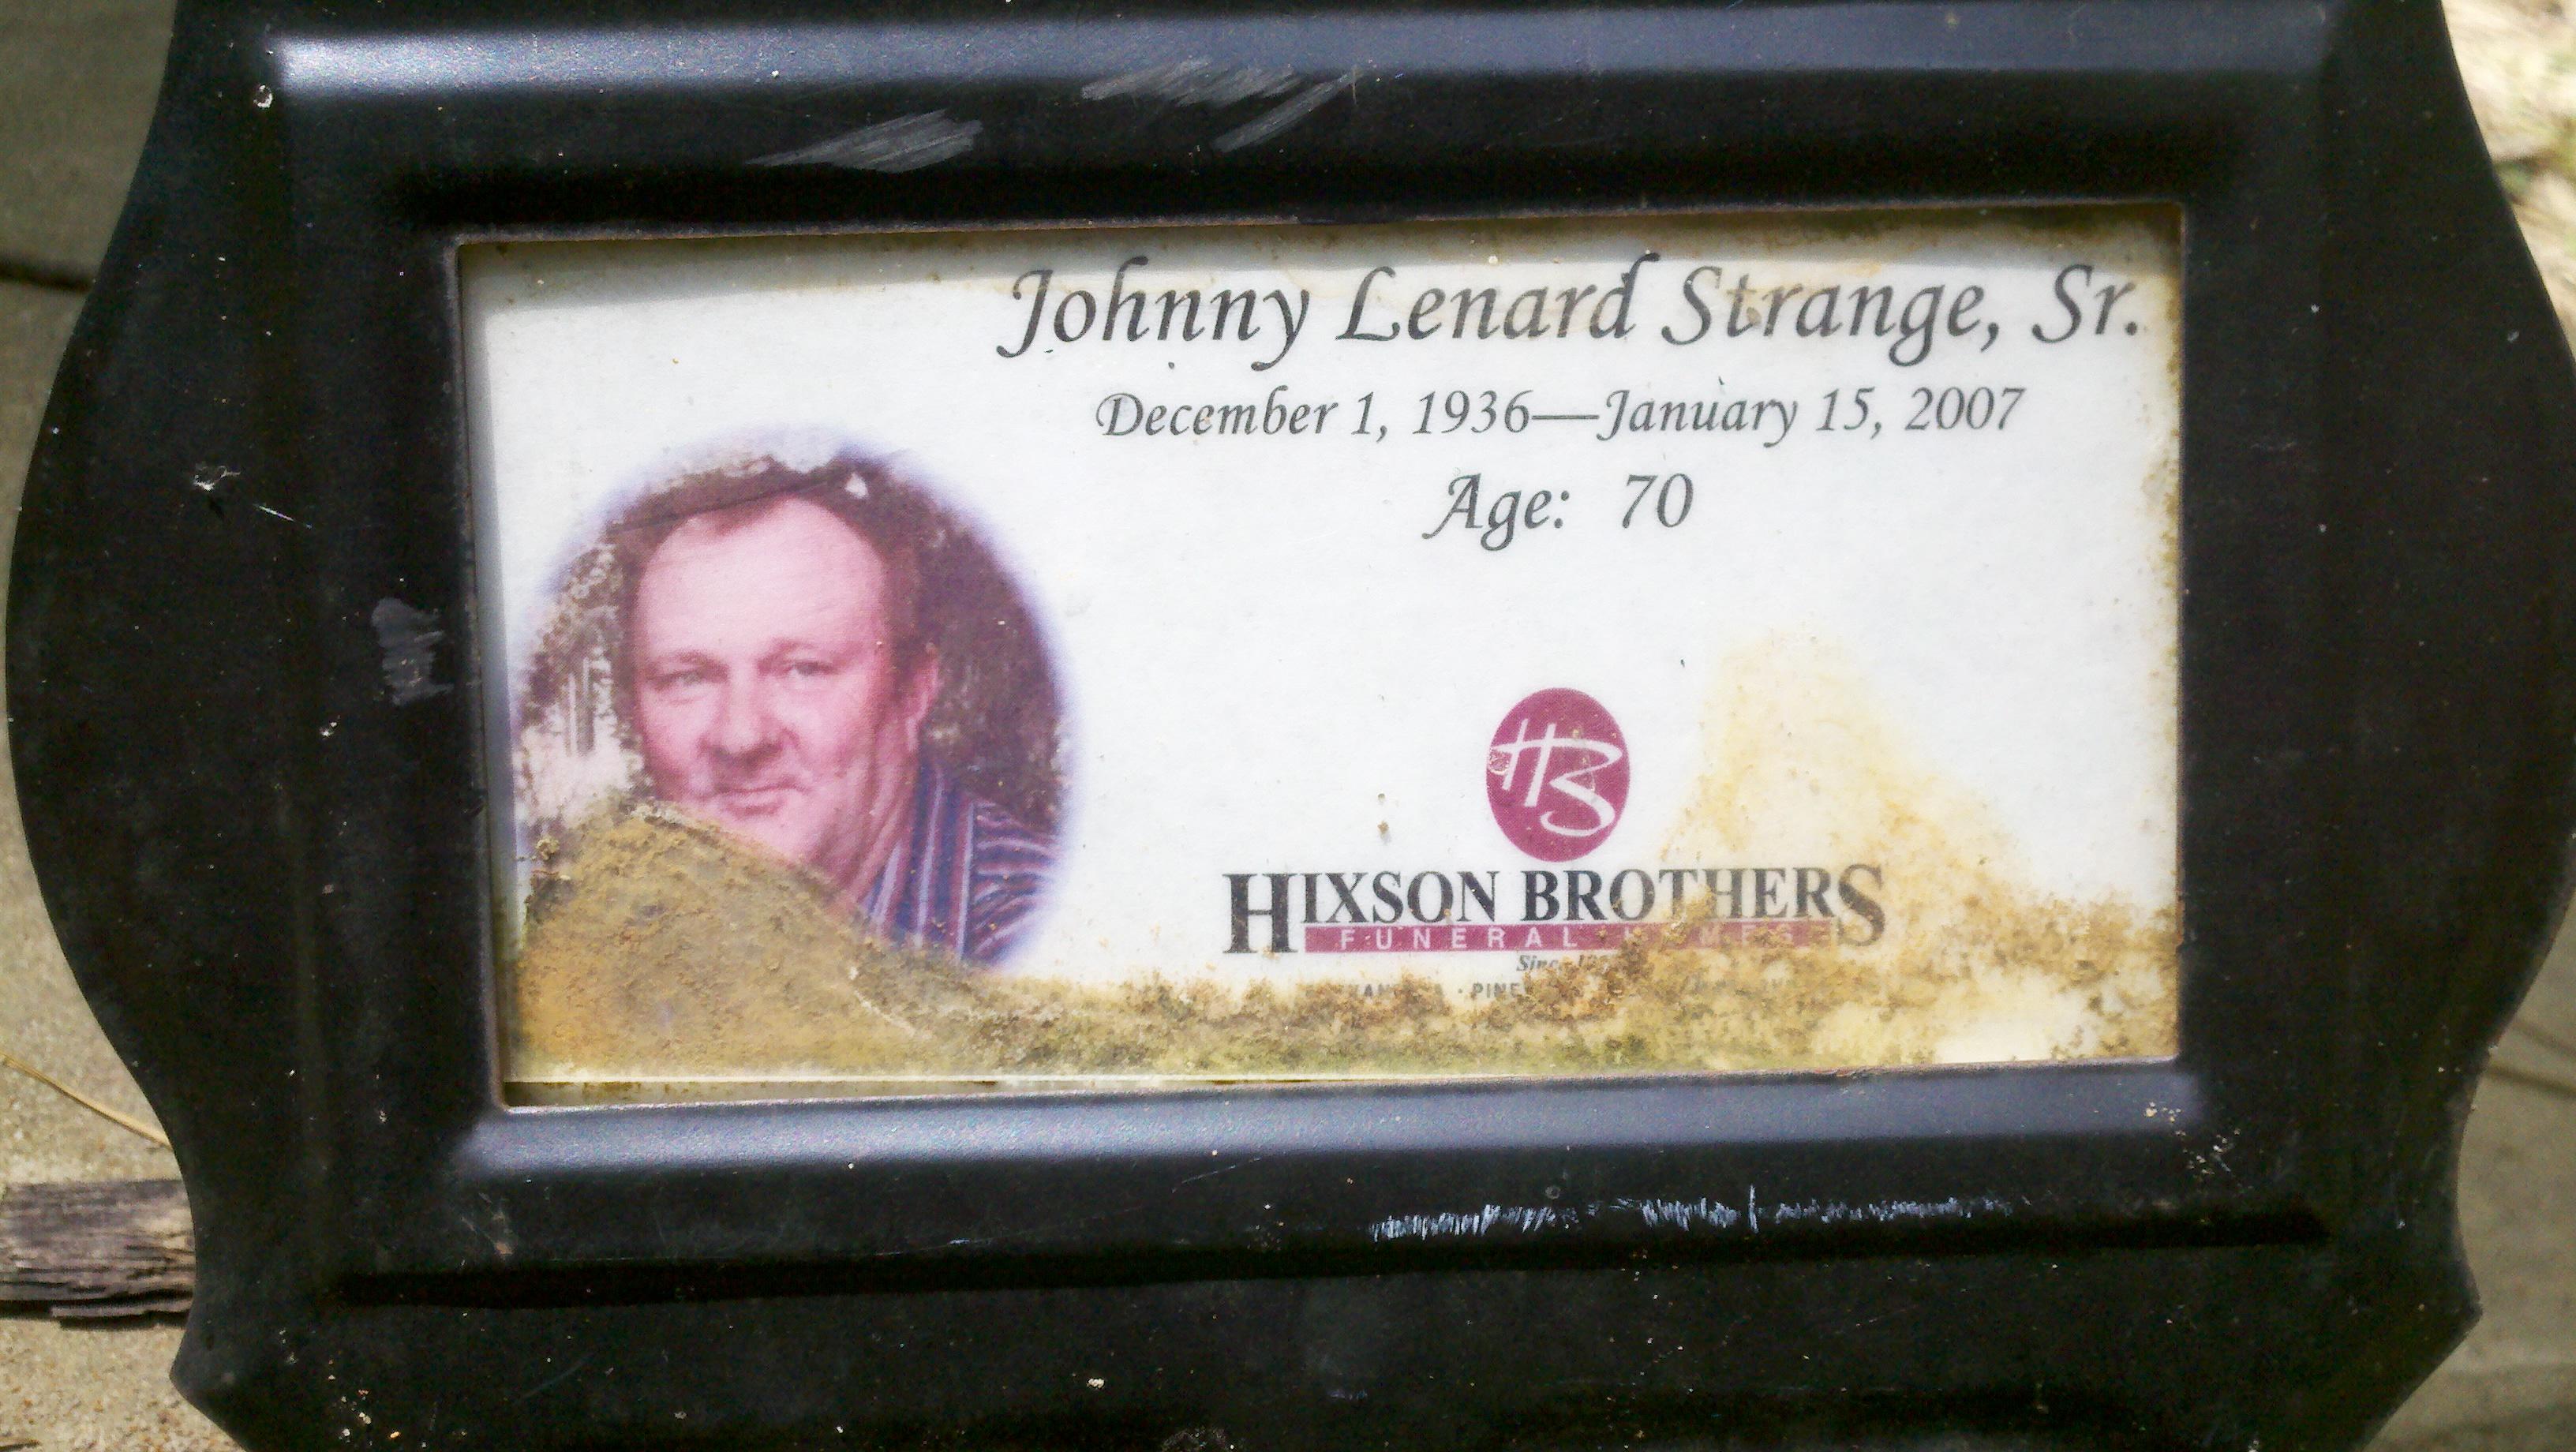 Johnny Erwin Strange